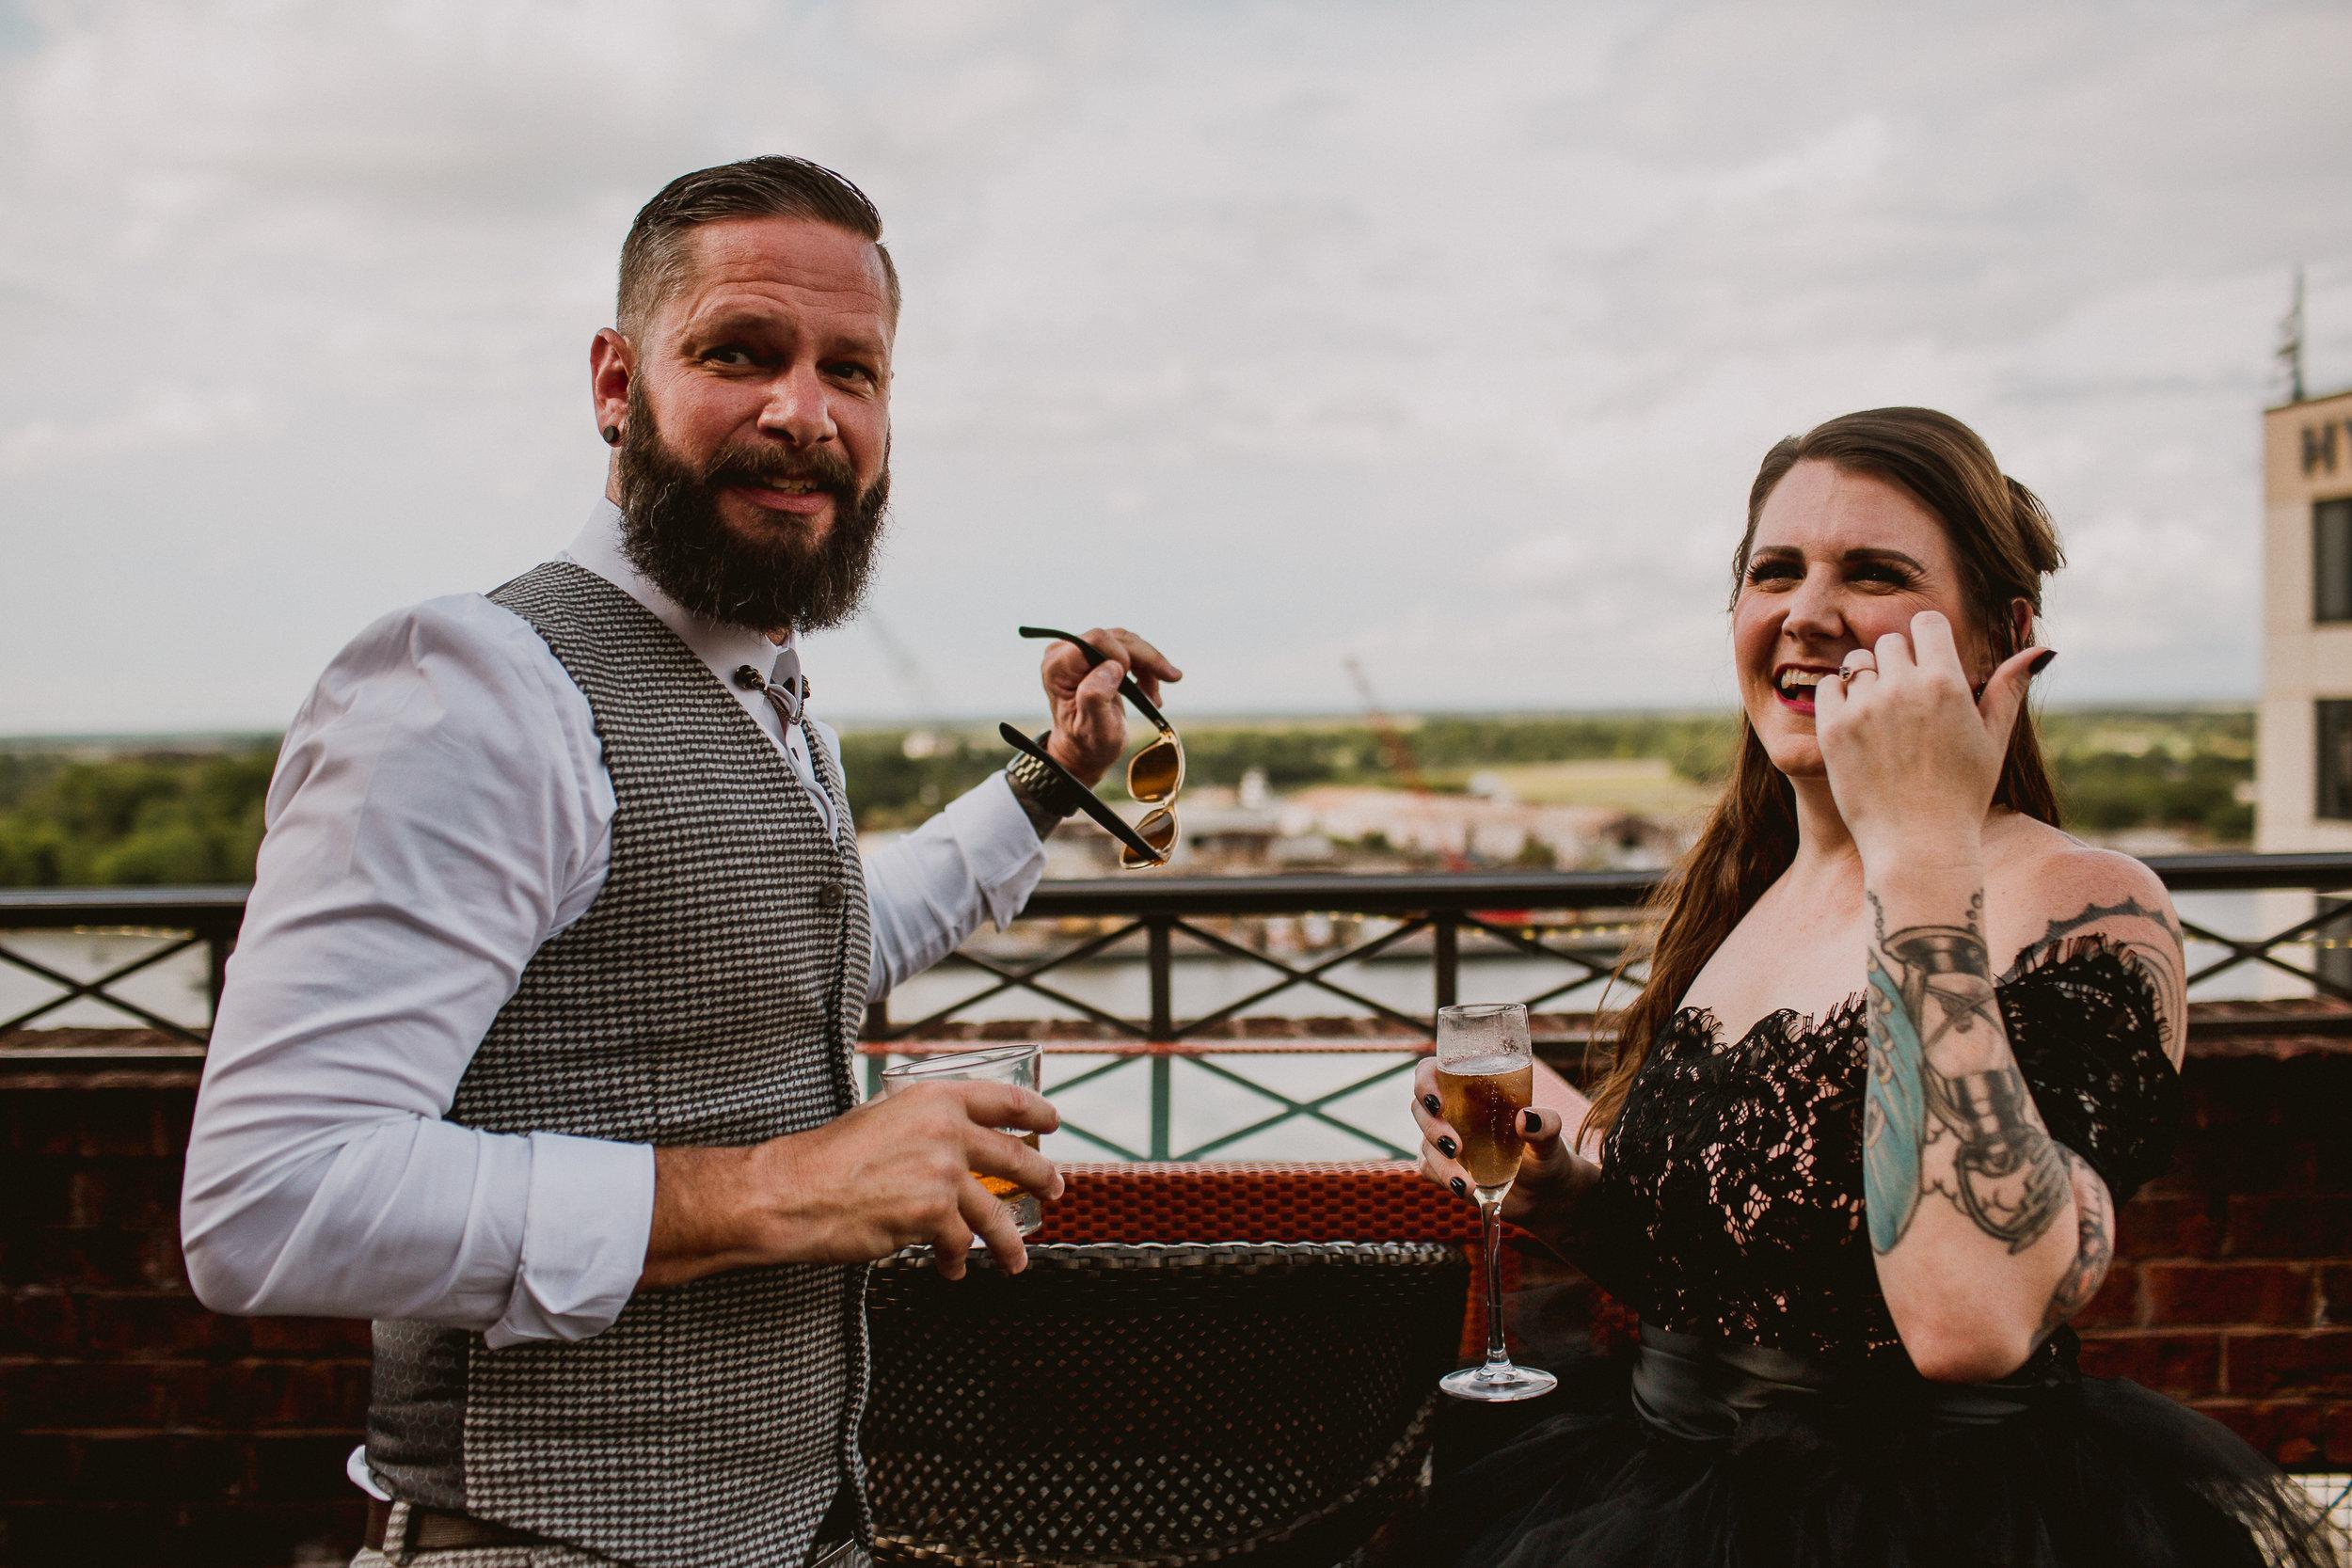 bohemian-hotel-savannah-elopement-kelley-raye-atlanta-wedding-photographer-48.jpg